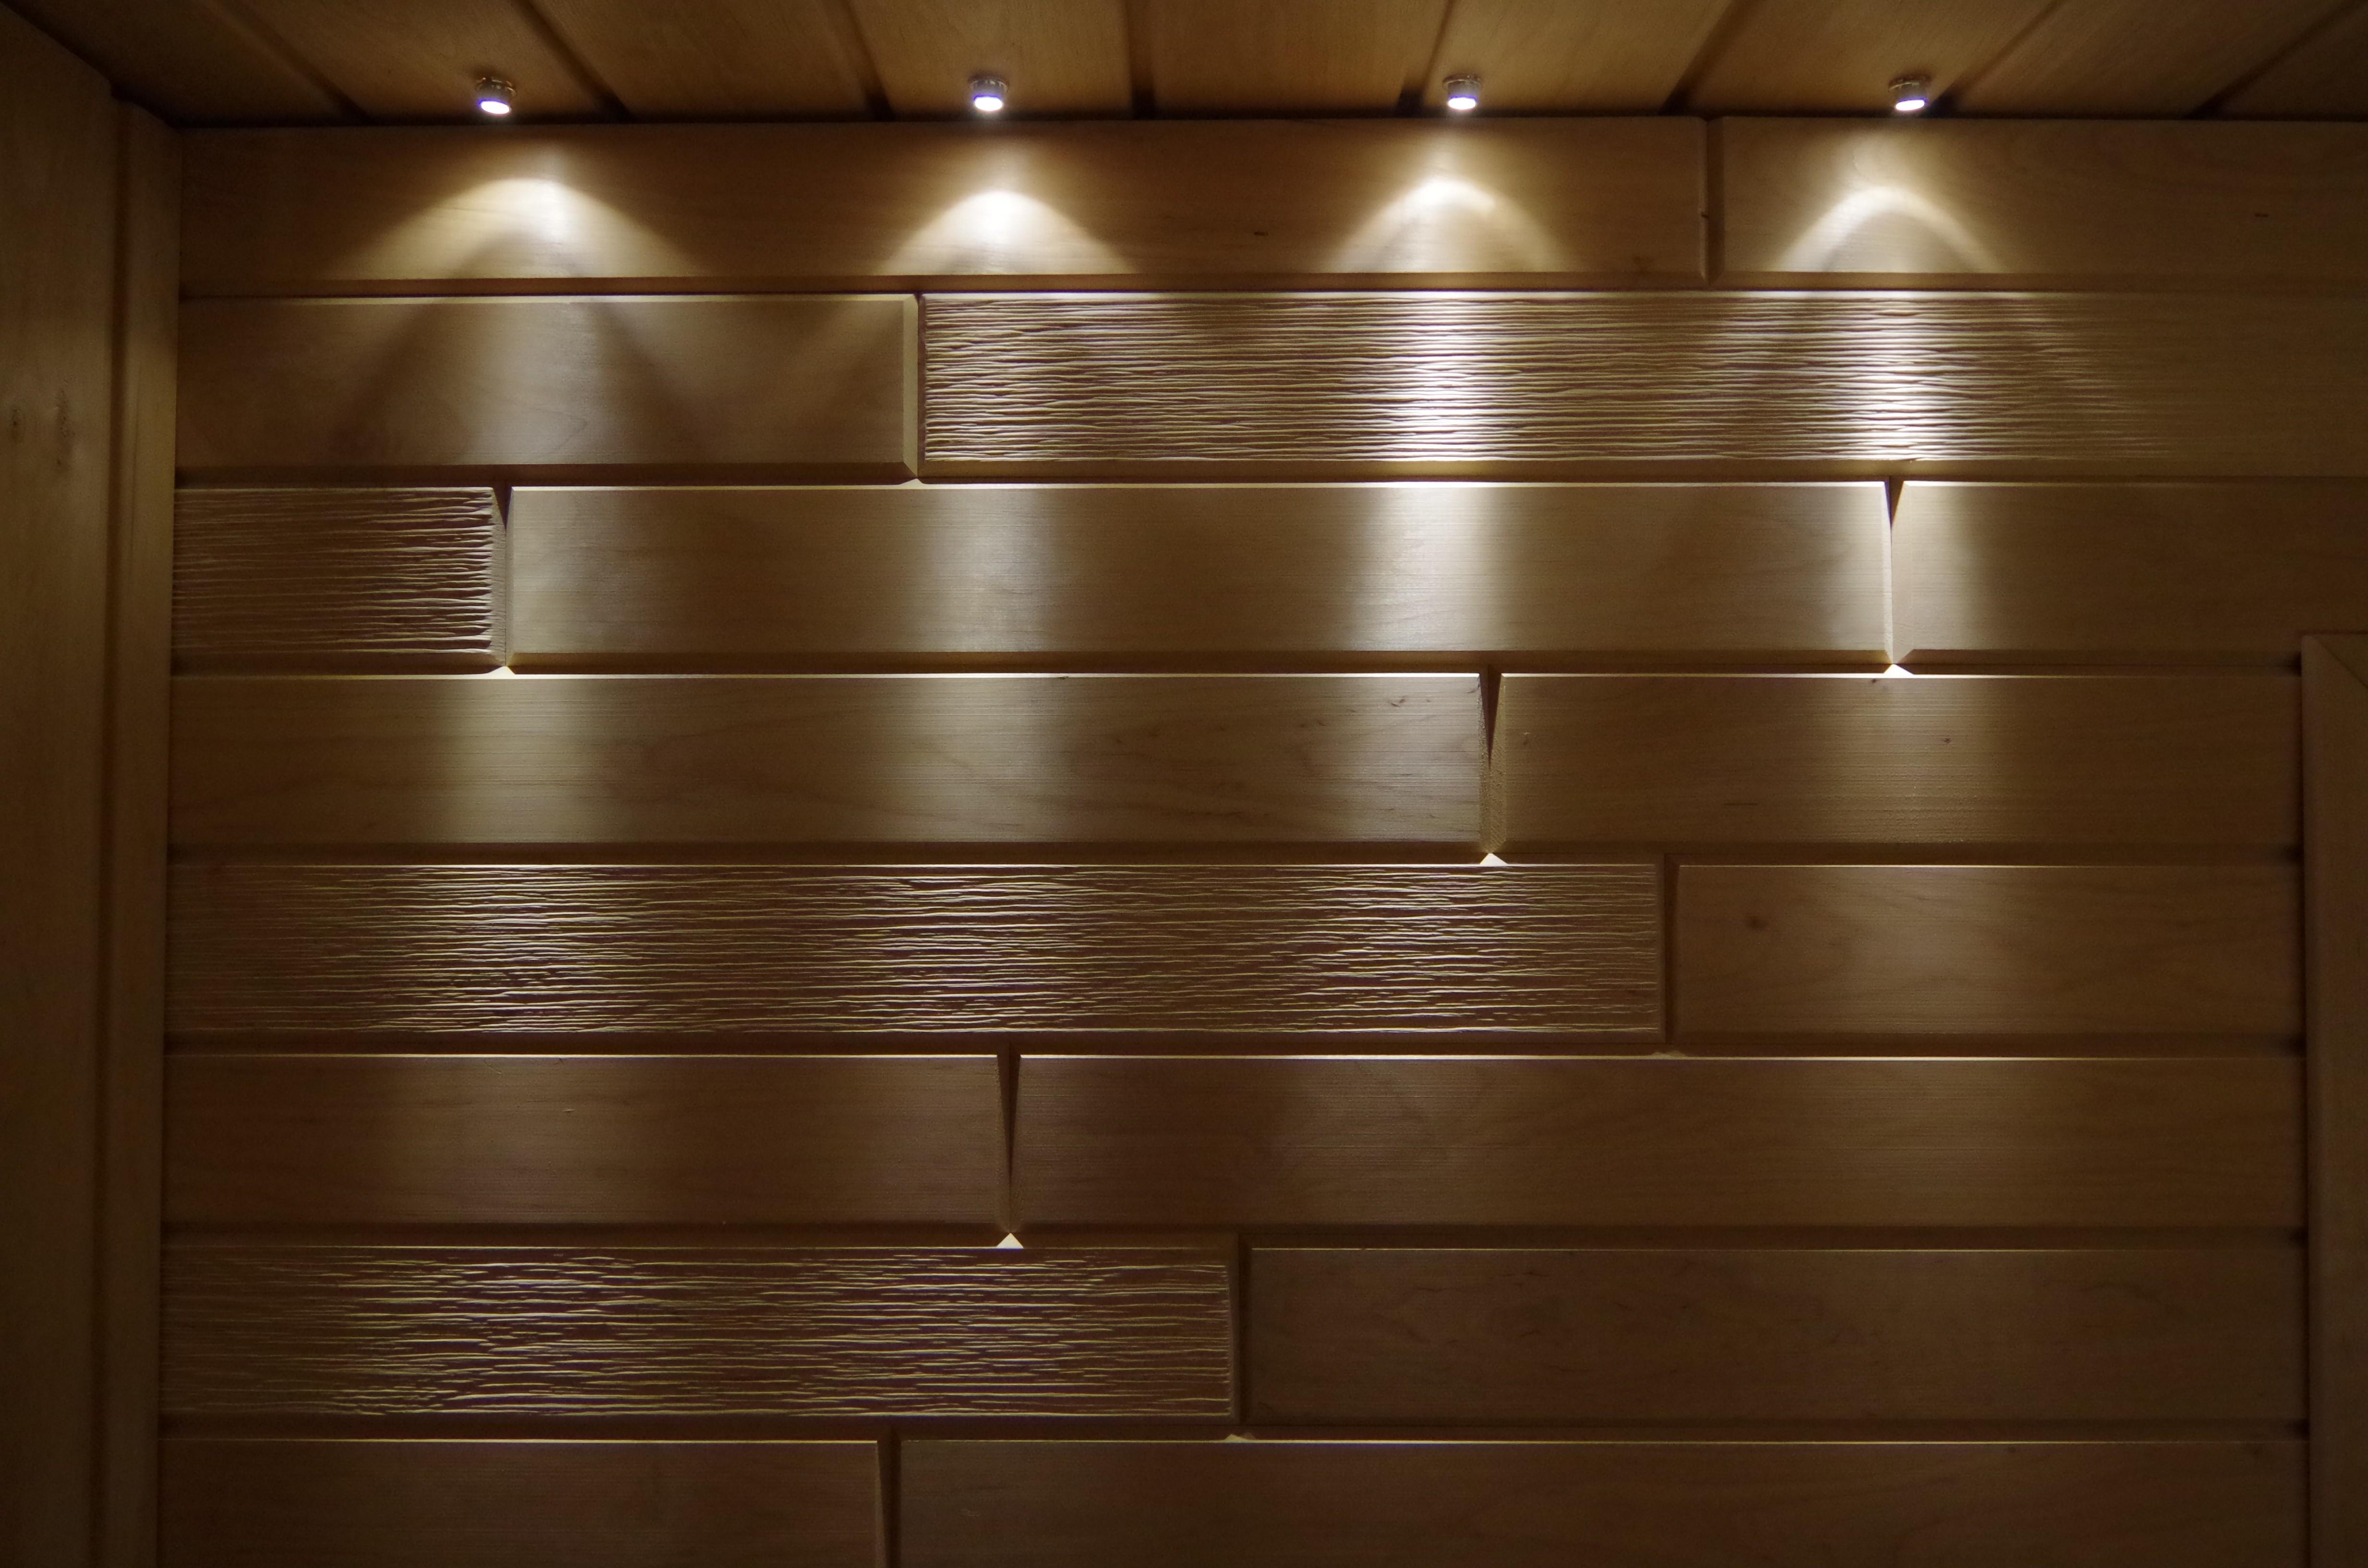 sauna led beleuchtung sun w lens modell warmwei material silber. Black Bedroom Furniture Sets. Home Design Ideas